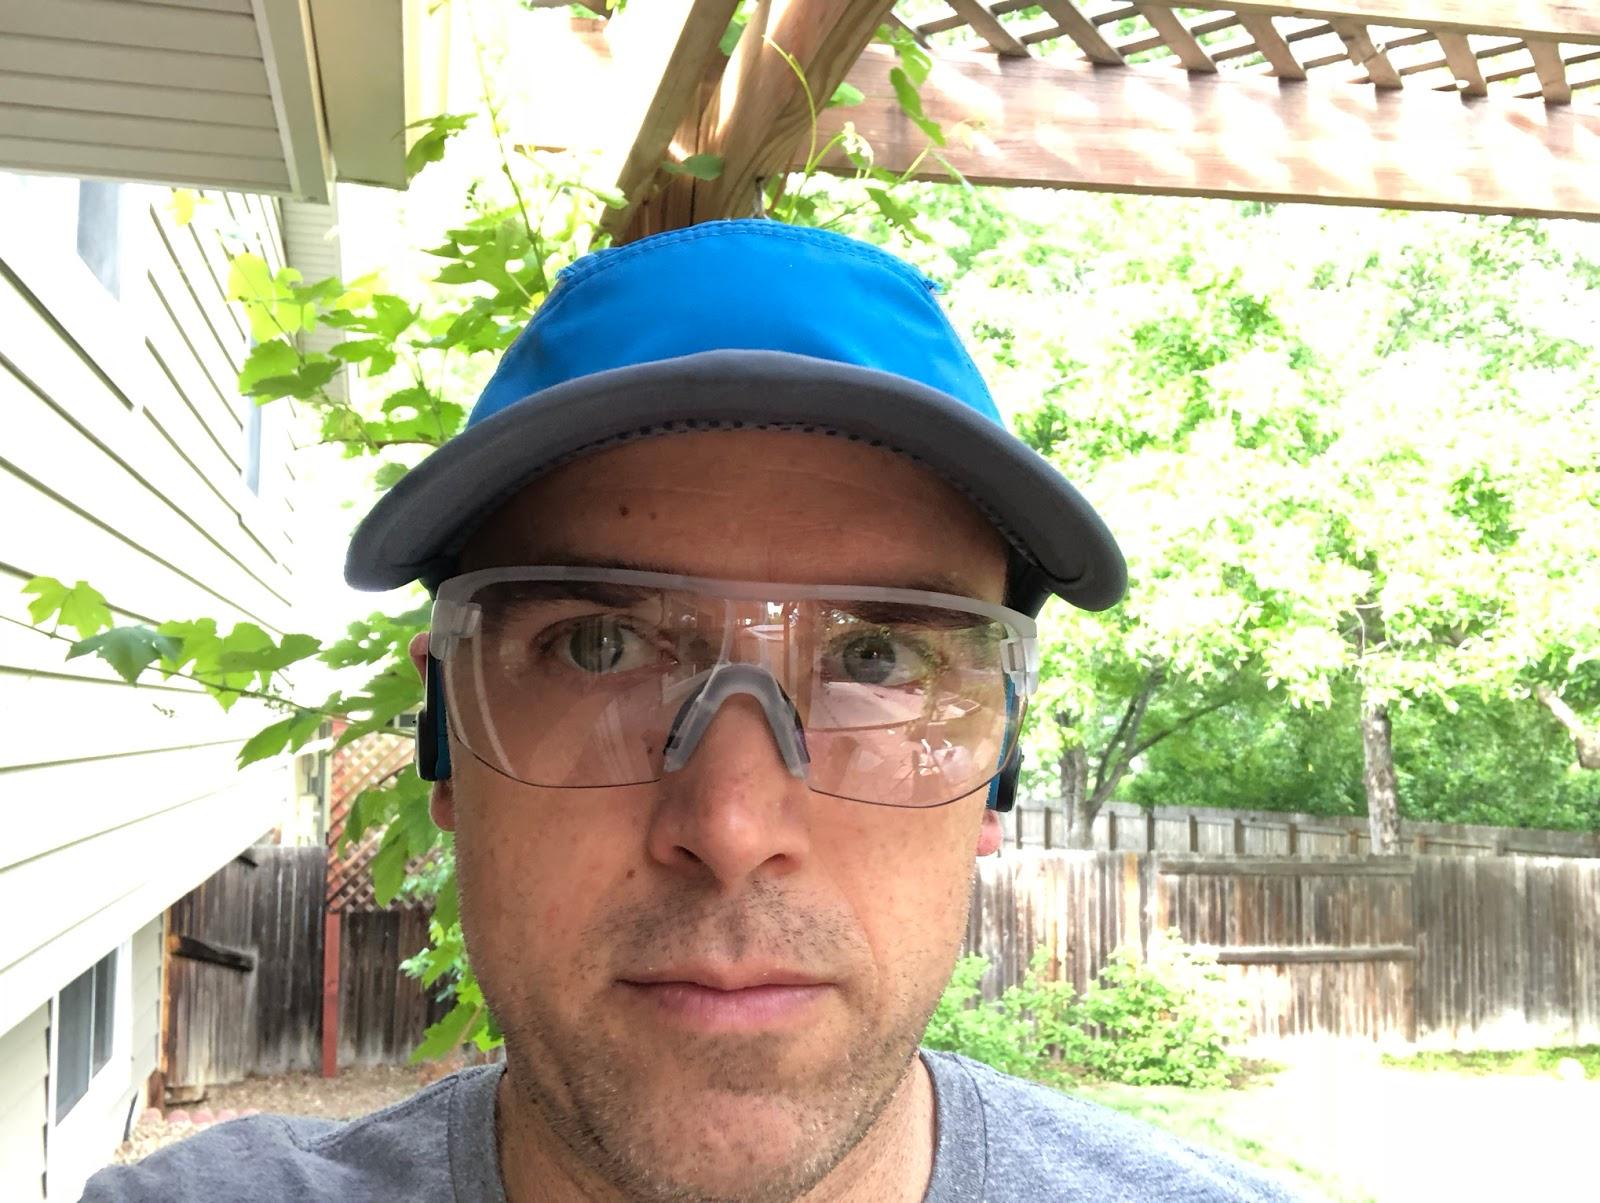 Fondo verde seguramente Señor  Road Trail Run: adidas Zonyk Aero Midcut Pro Sunglasses Review